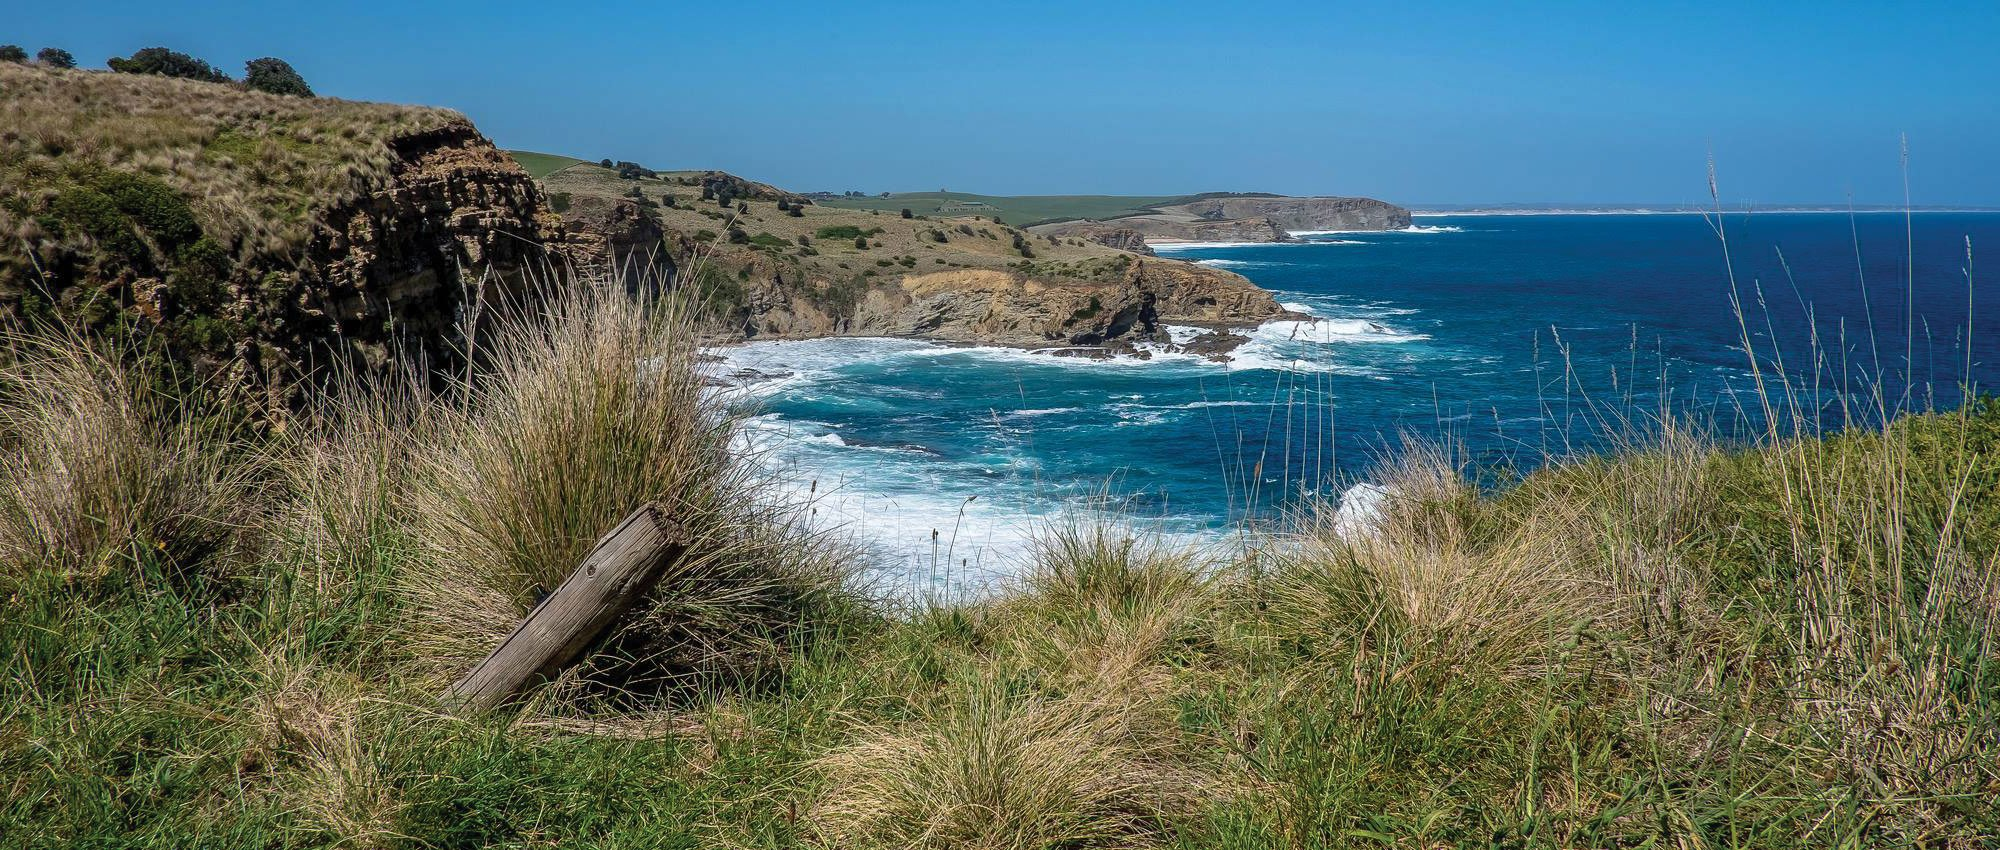 Holiday Homes Phillip Island